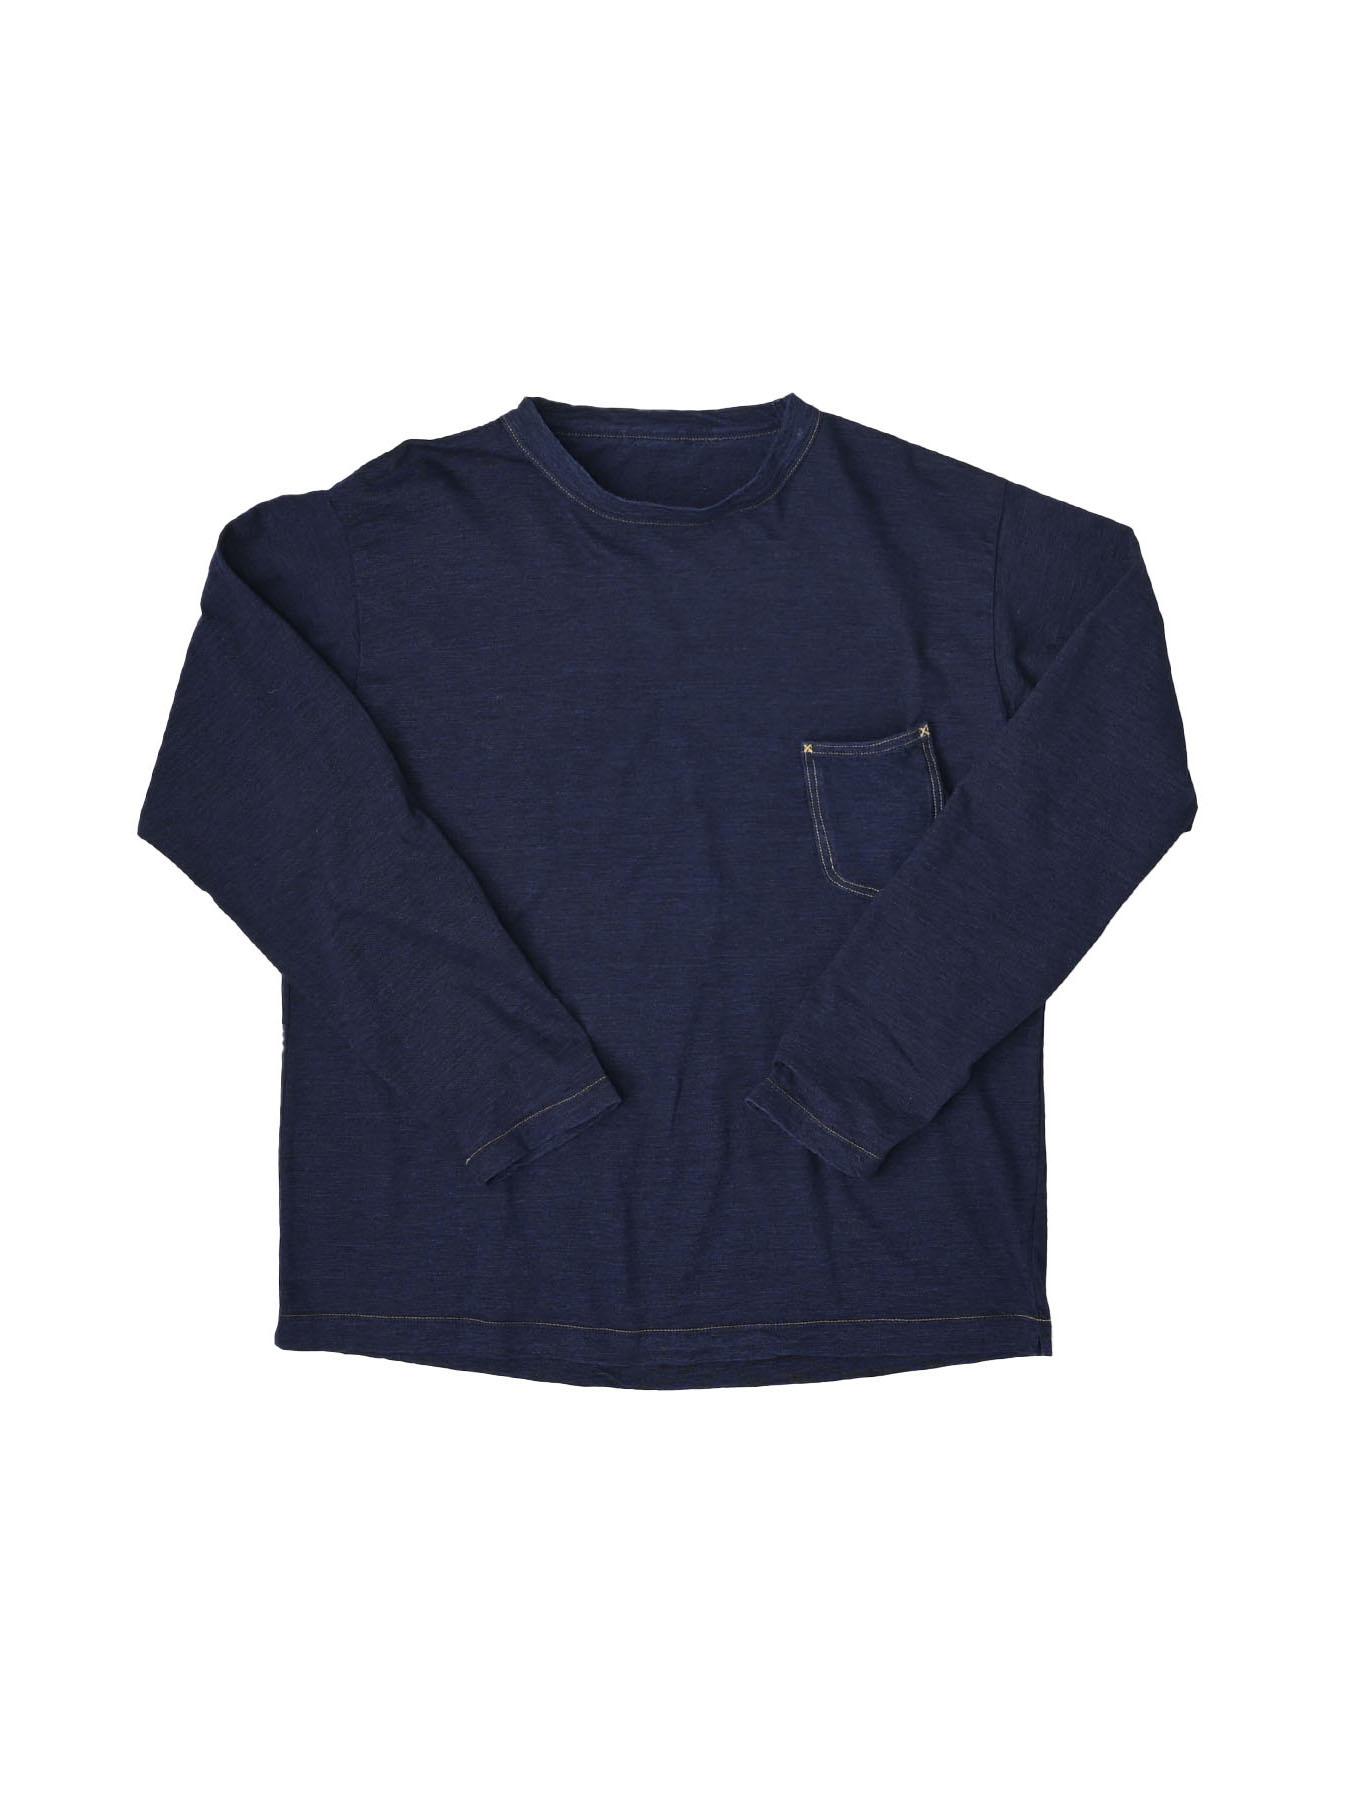 Indigo Zimbabwe 908 Ocean T-shirt-1